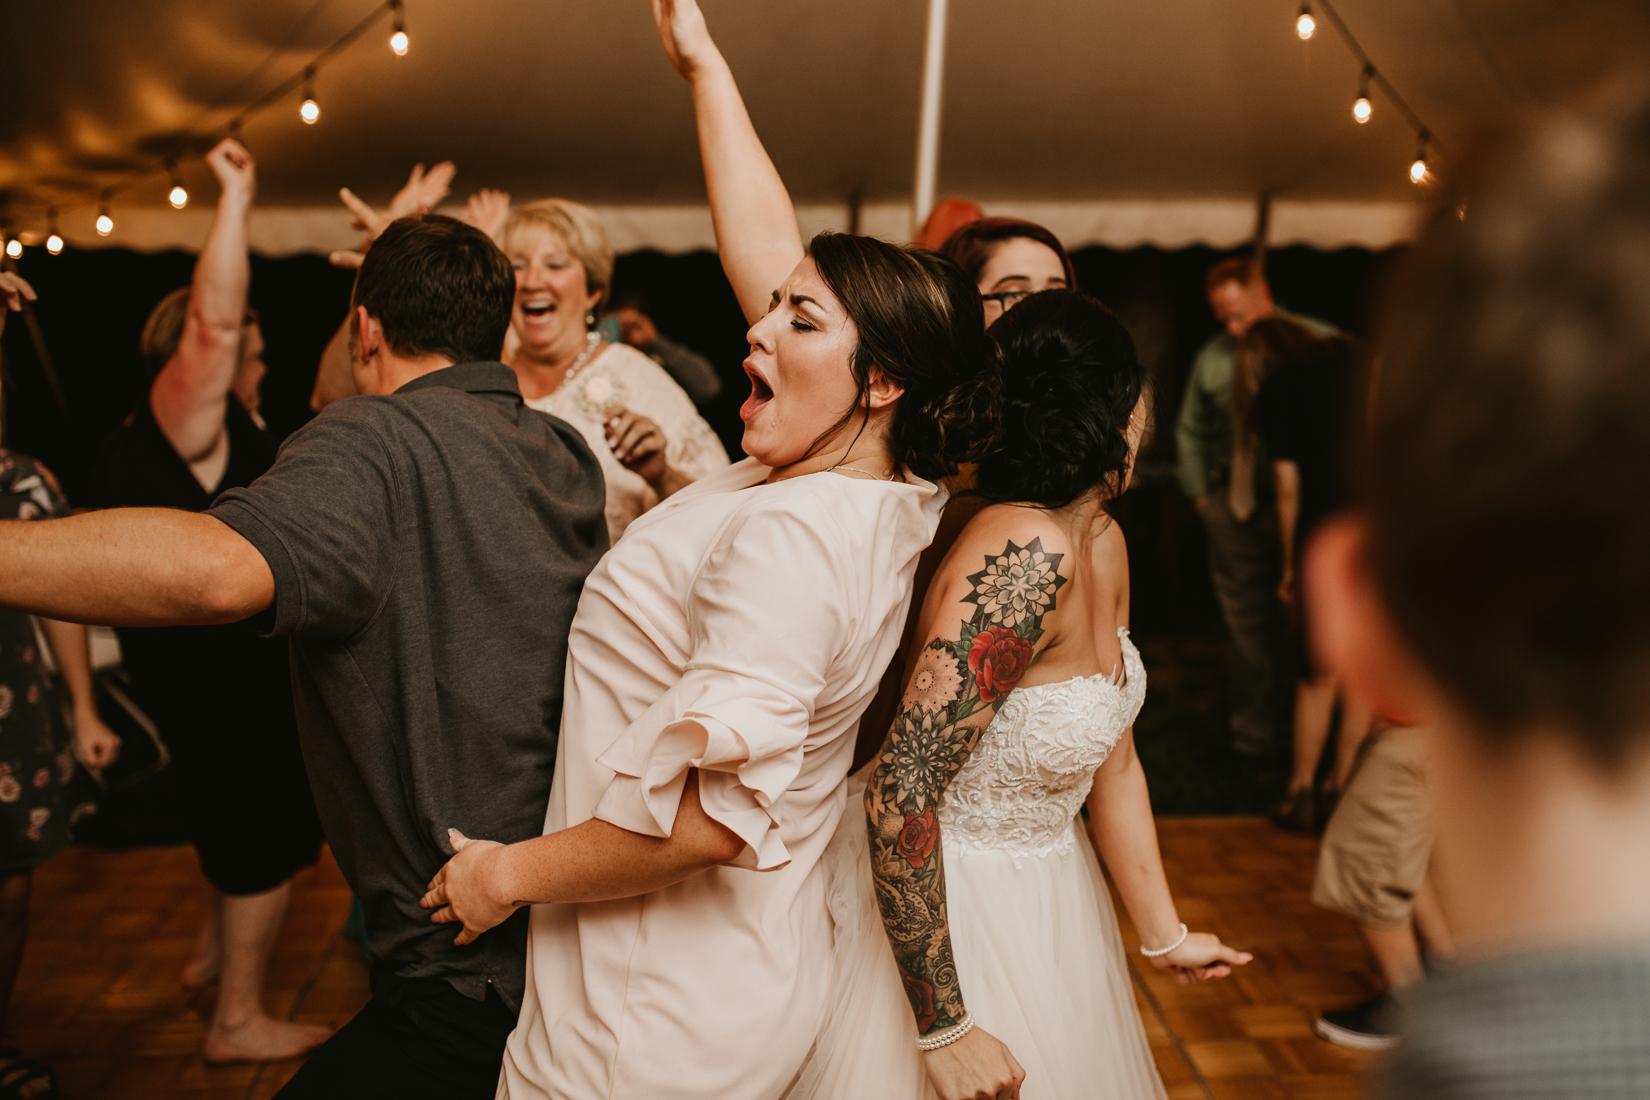 olivia_zay_wedding_09_2018-9140.jpg